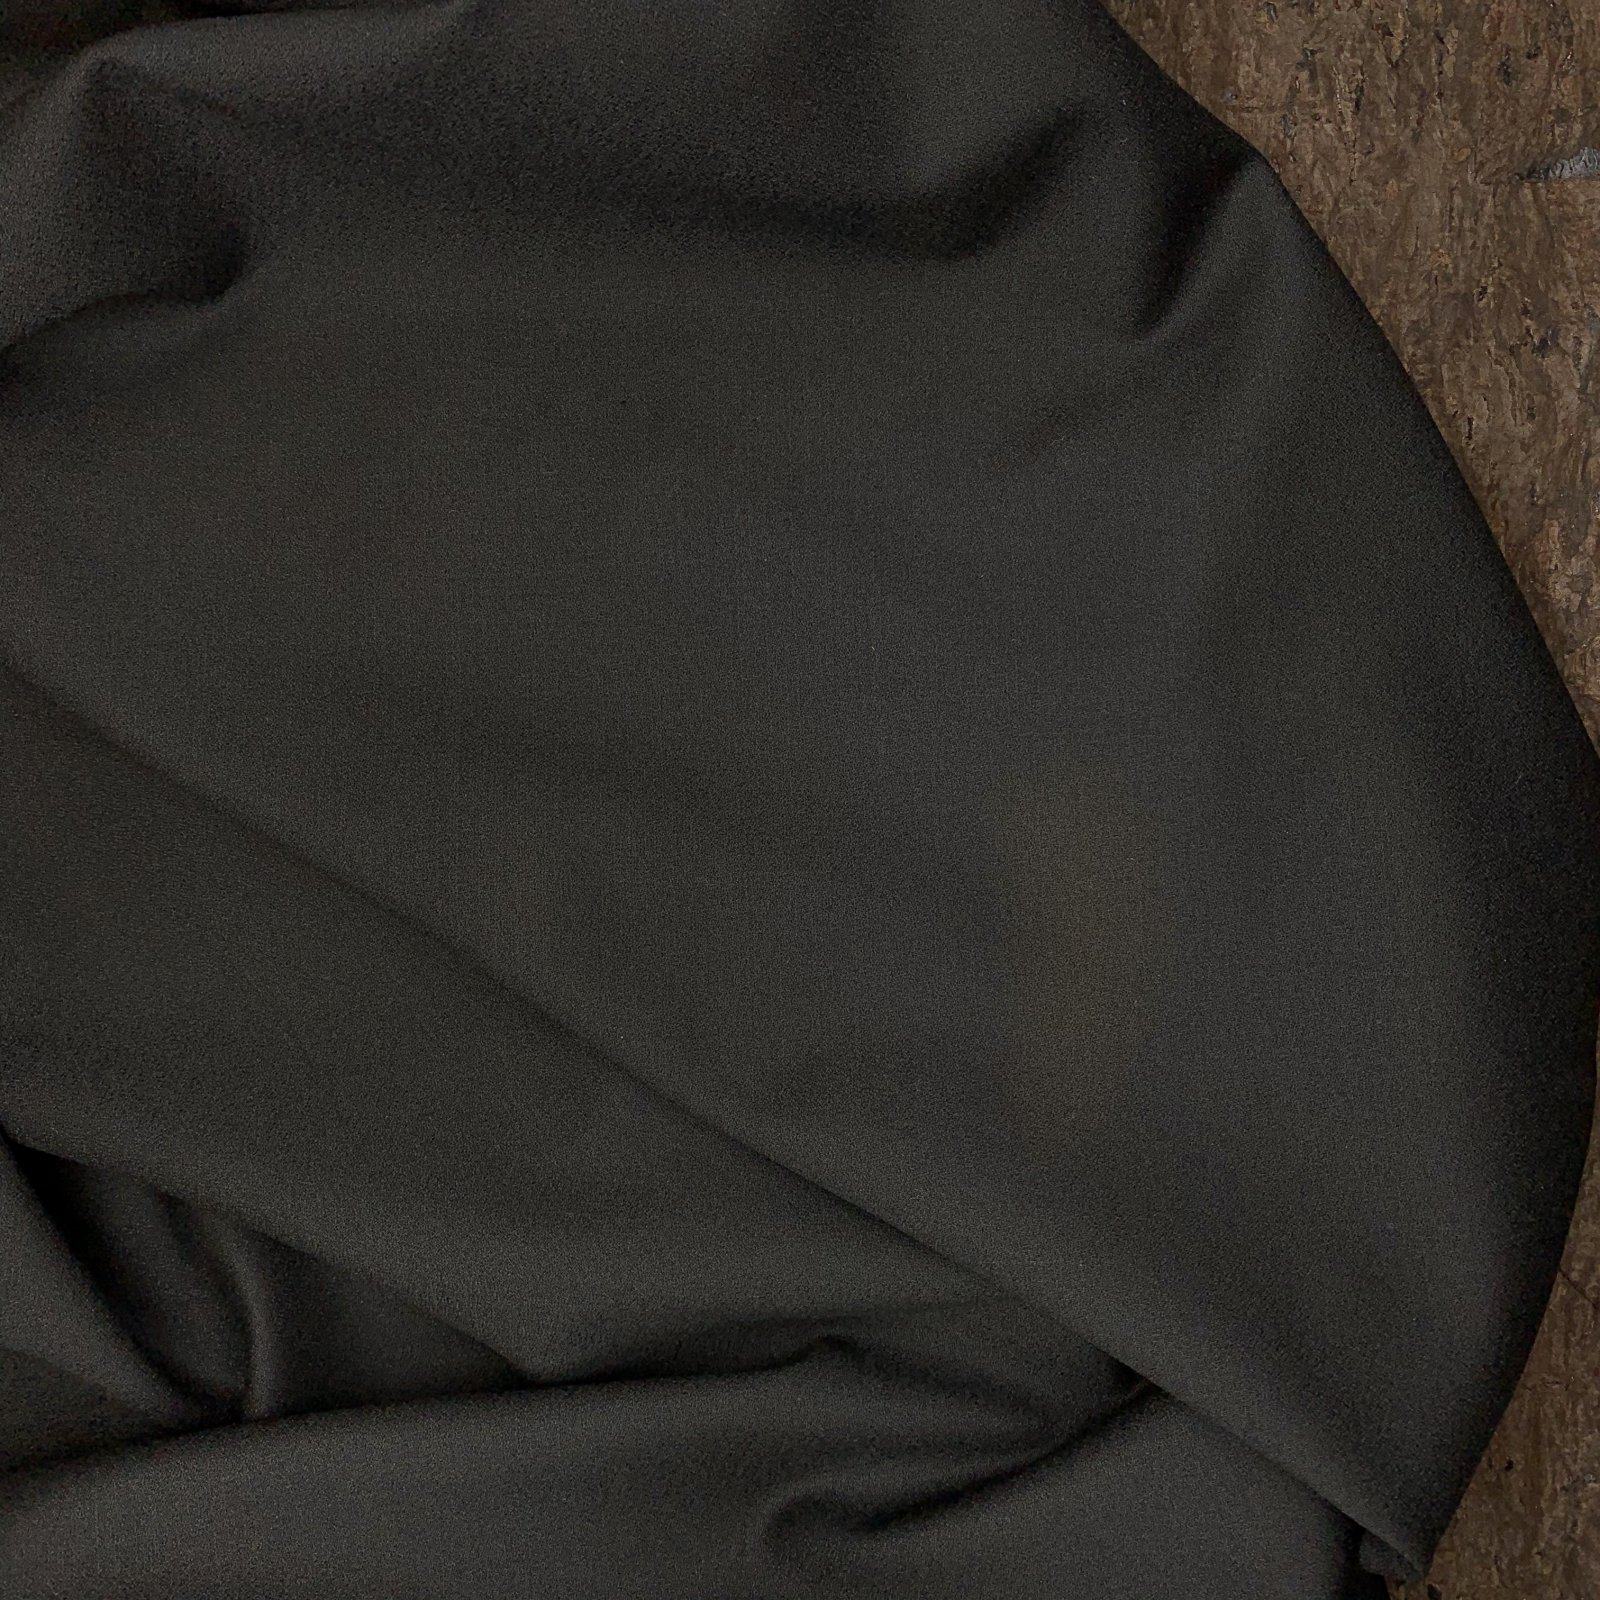 Black Stretch Crepe - Italian Wool